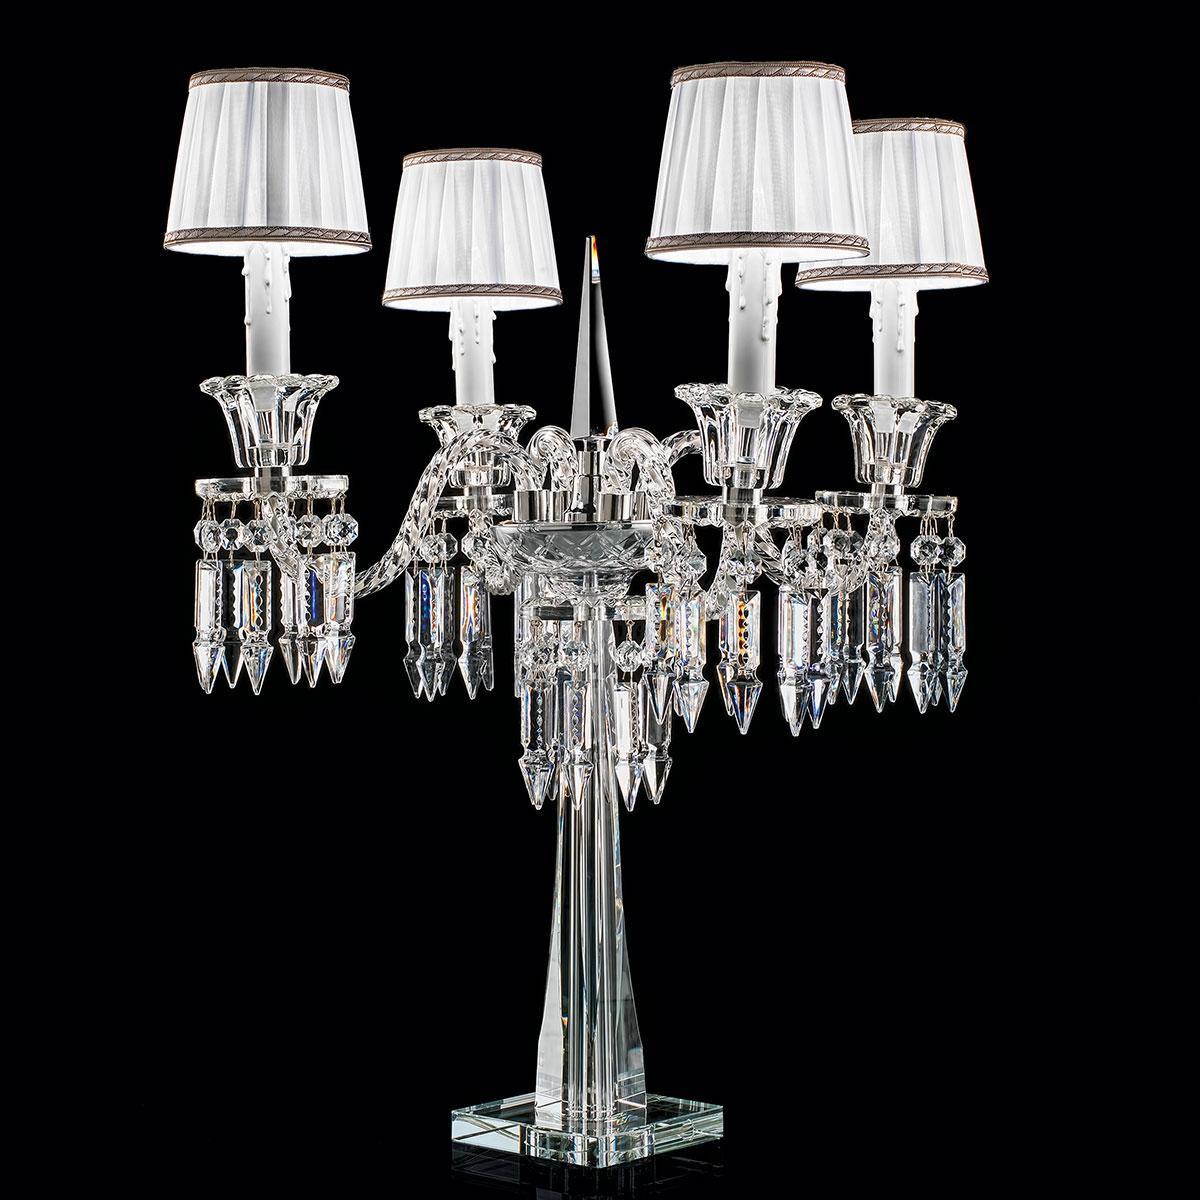 """Cima"" lampara de sobremesa veneciana en cristal con pantallas - 4 luces - transparente"